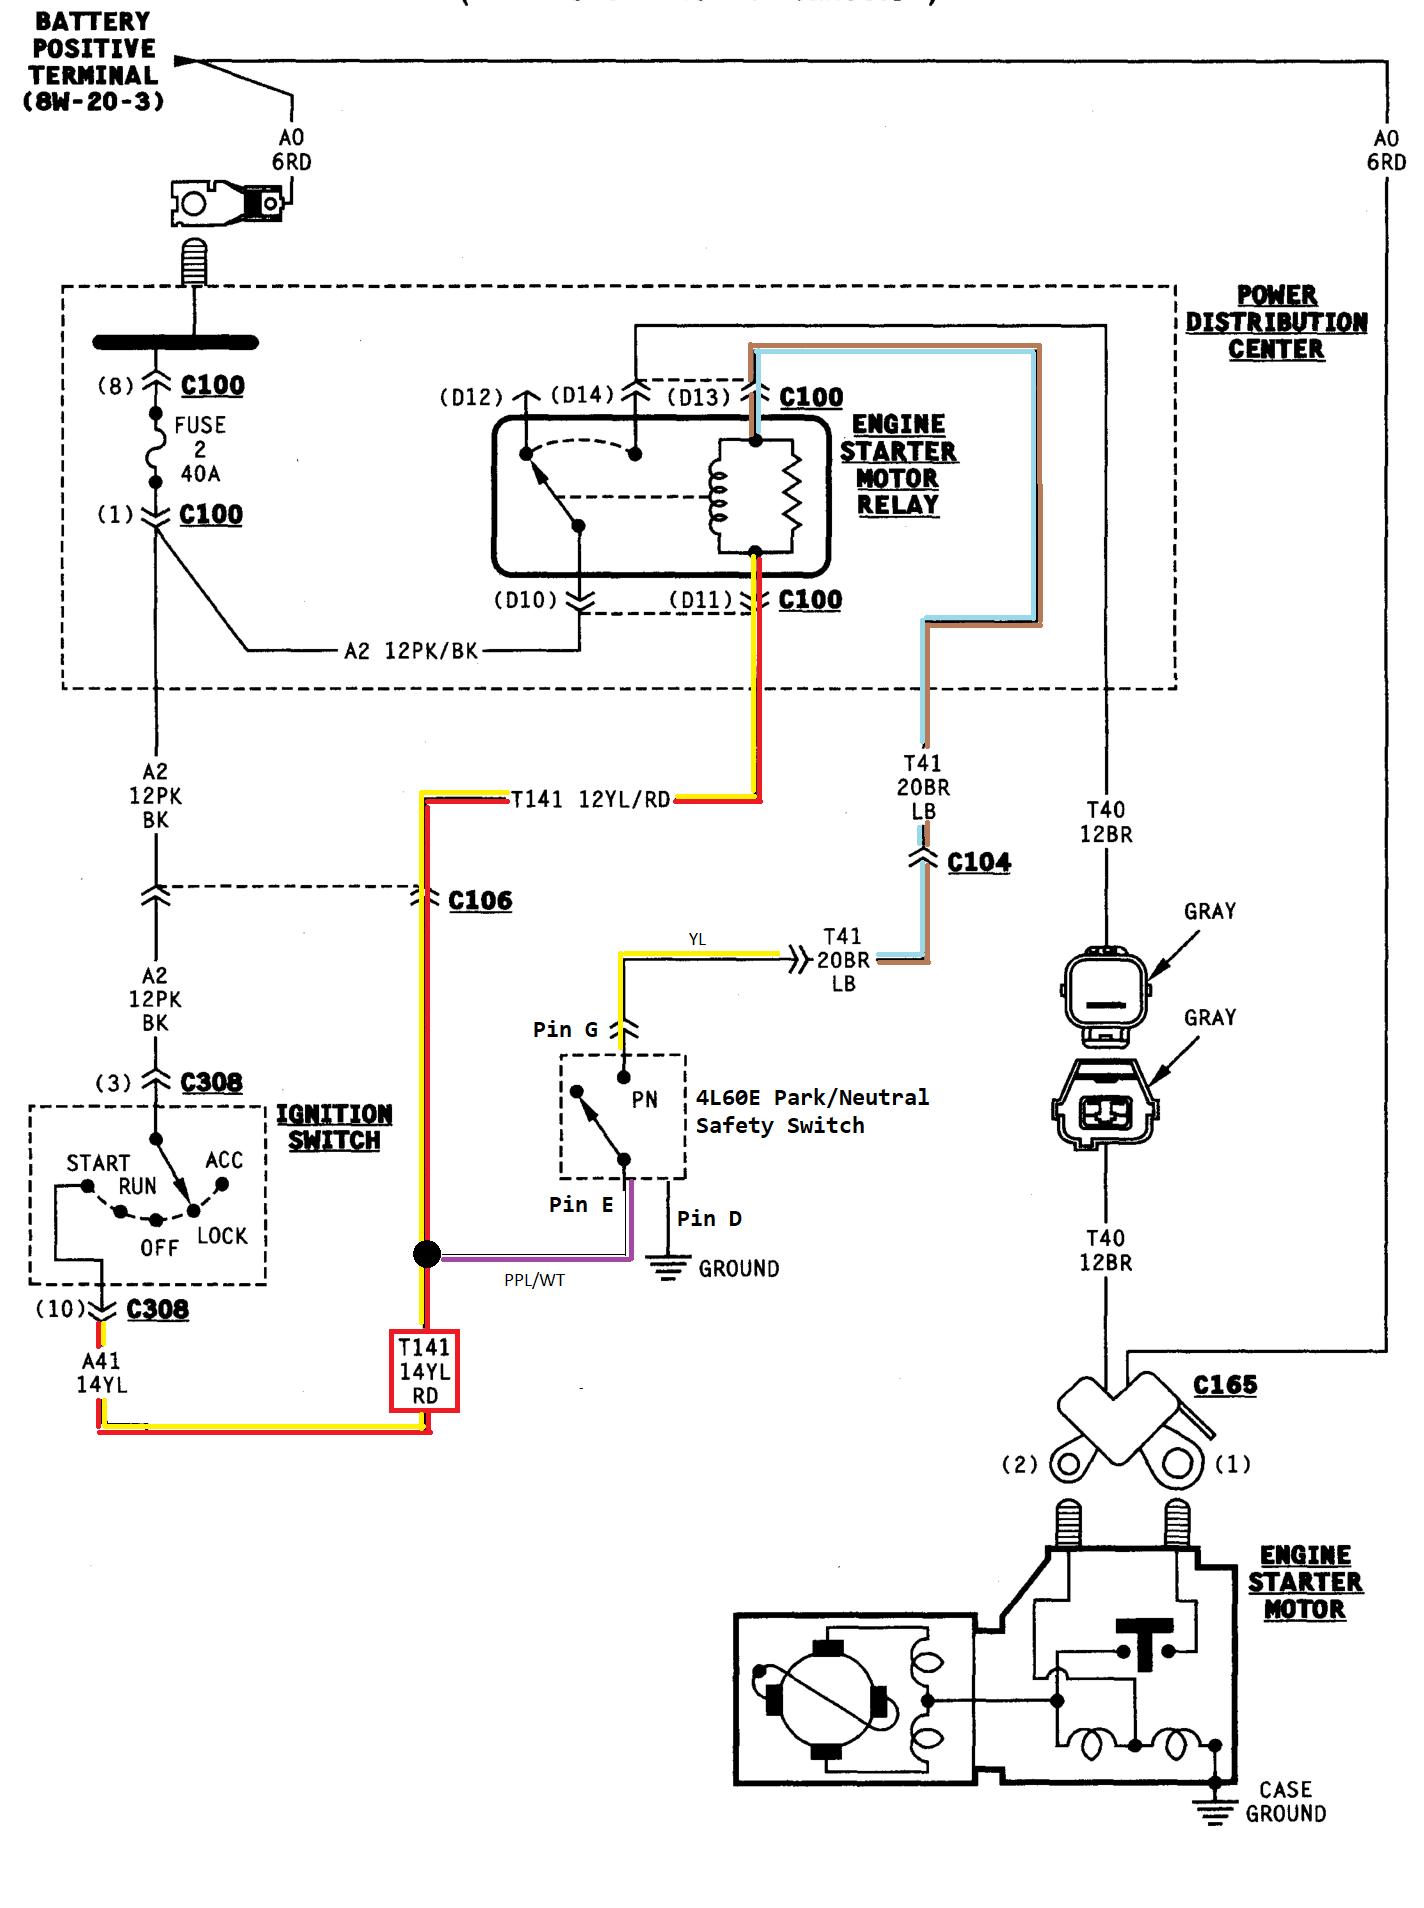 Park Neutral Safety Switch Wiring